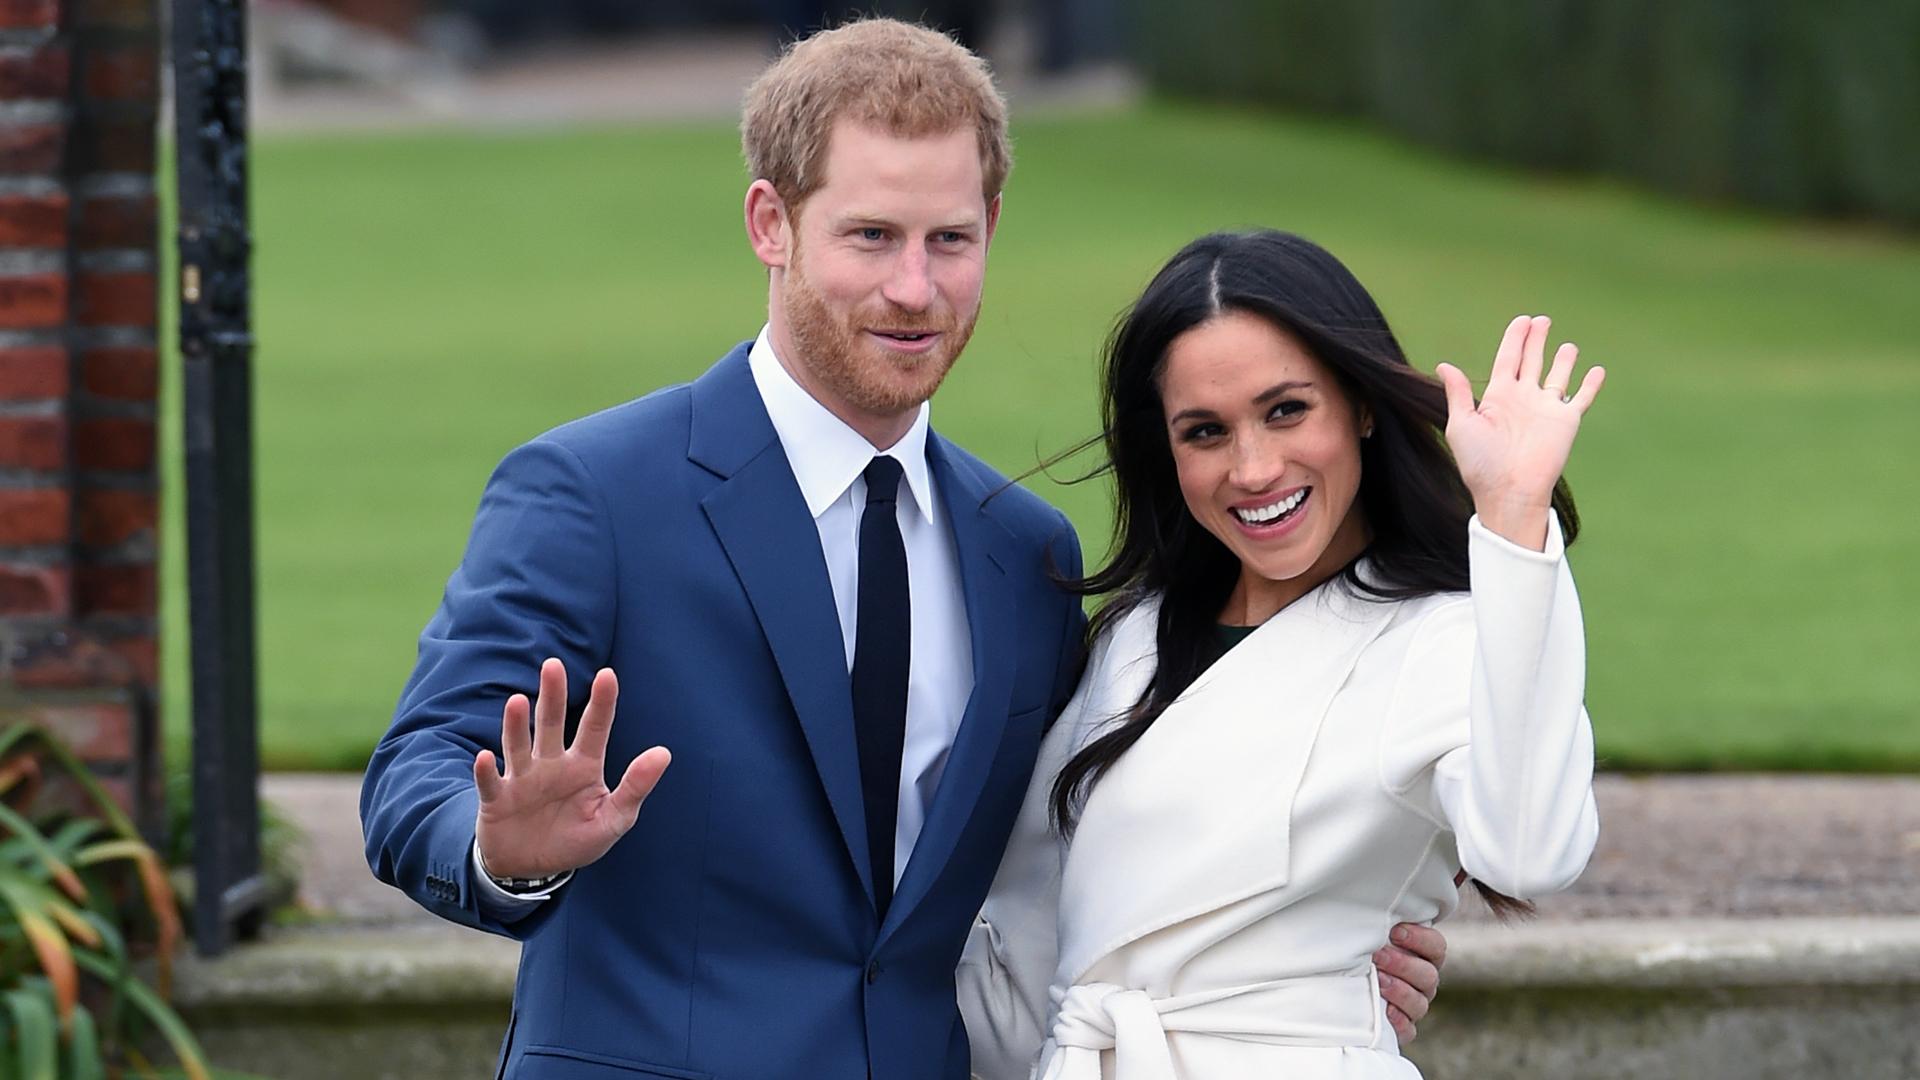 Prince Harry Meghan Markle engagement wave-159532.jpg22695877